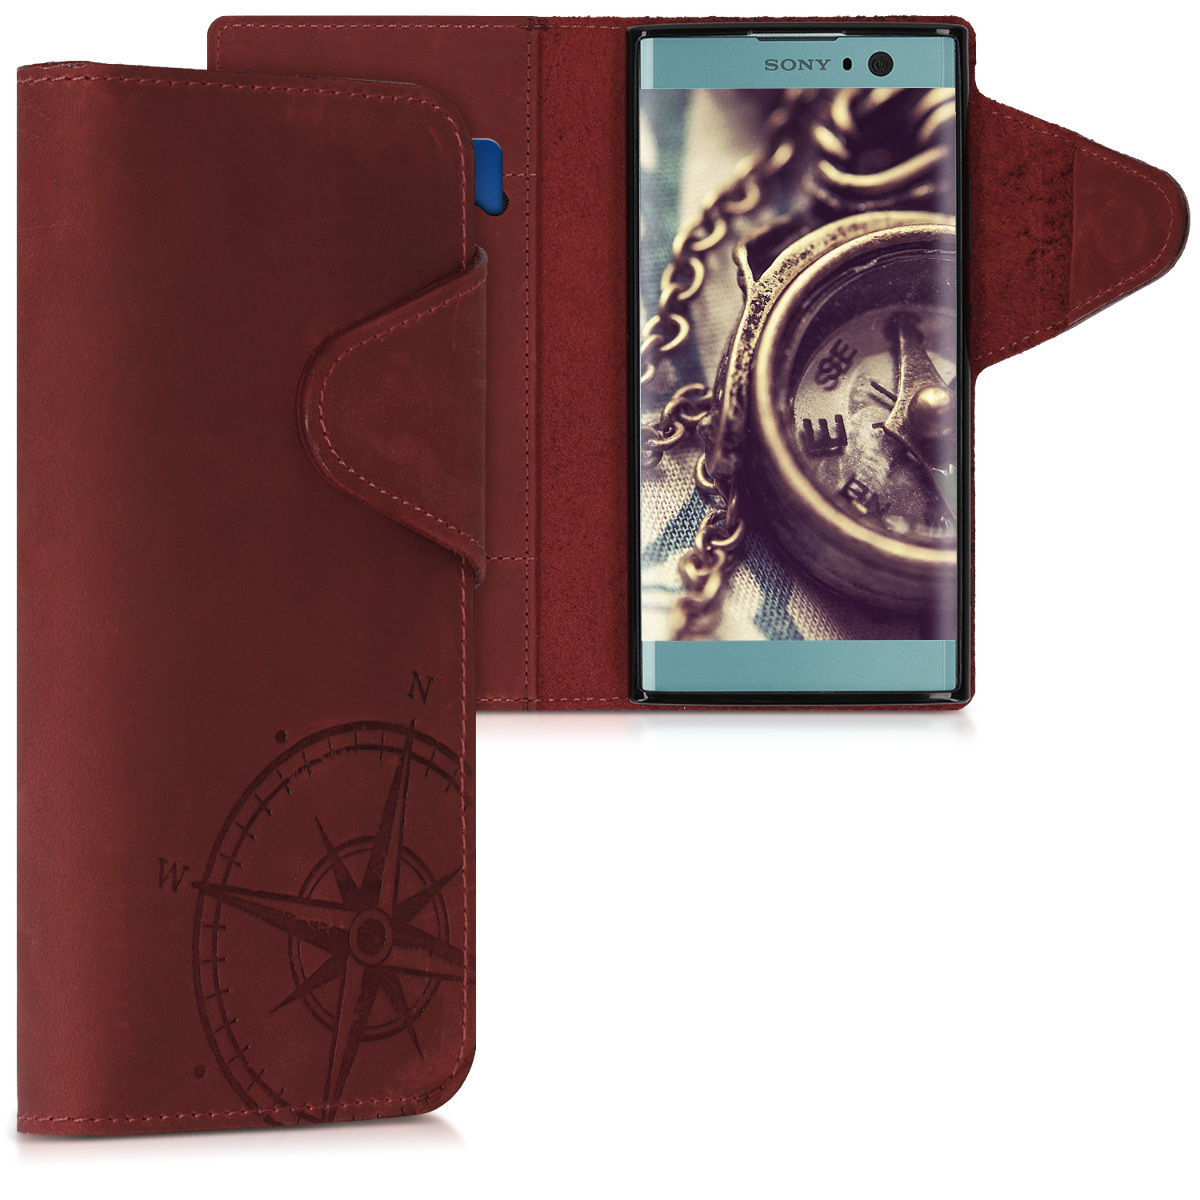 Kalibri Δερμάτινη Suede Θήκη - Πορτοφόλι Sony Xperia XA2 - Dark Red Compass (46719.01)